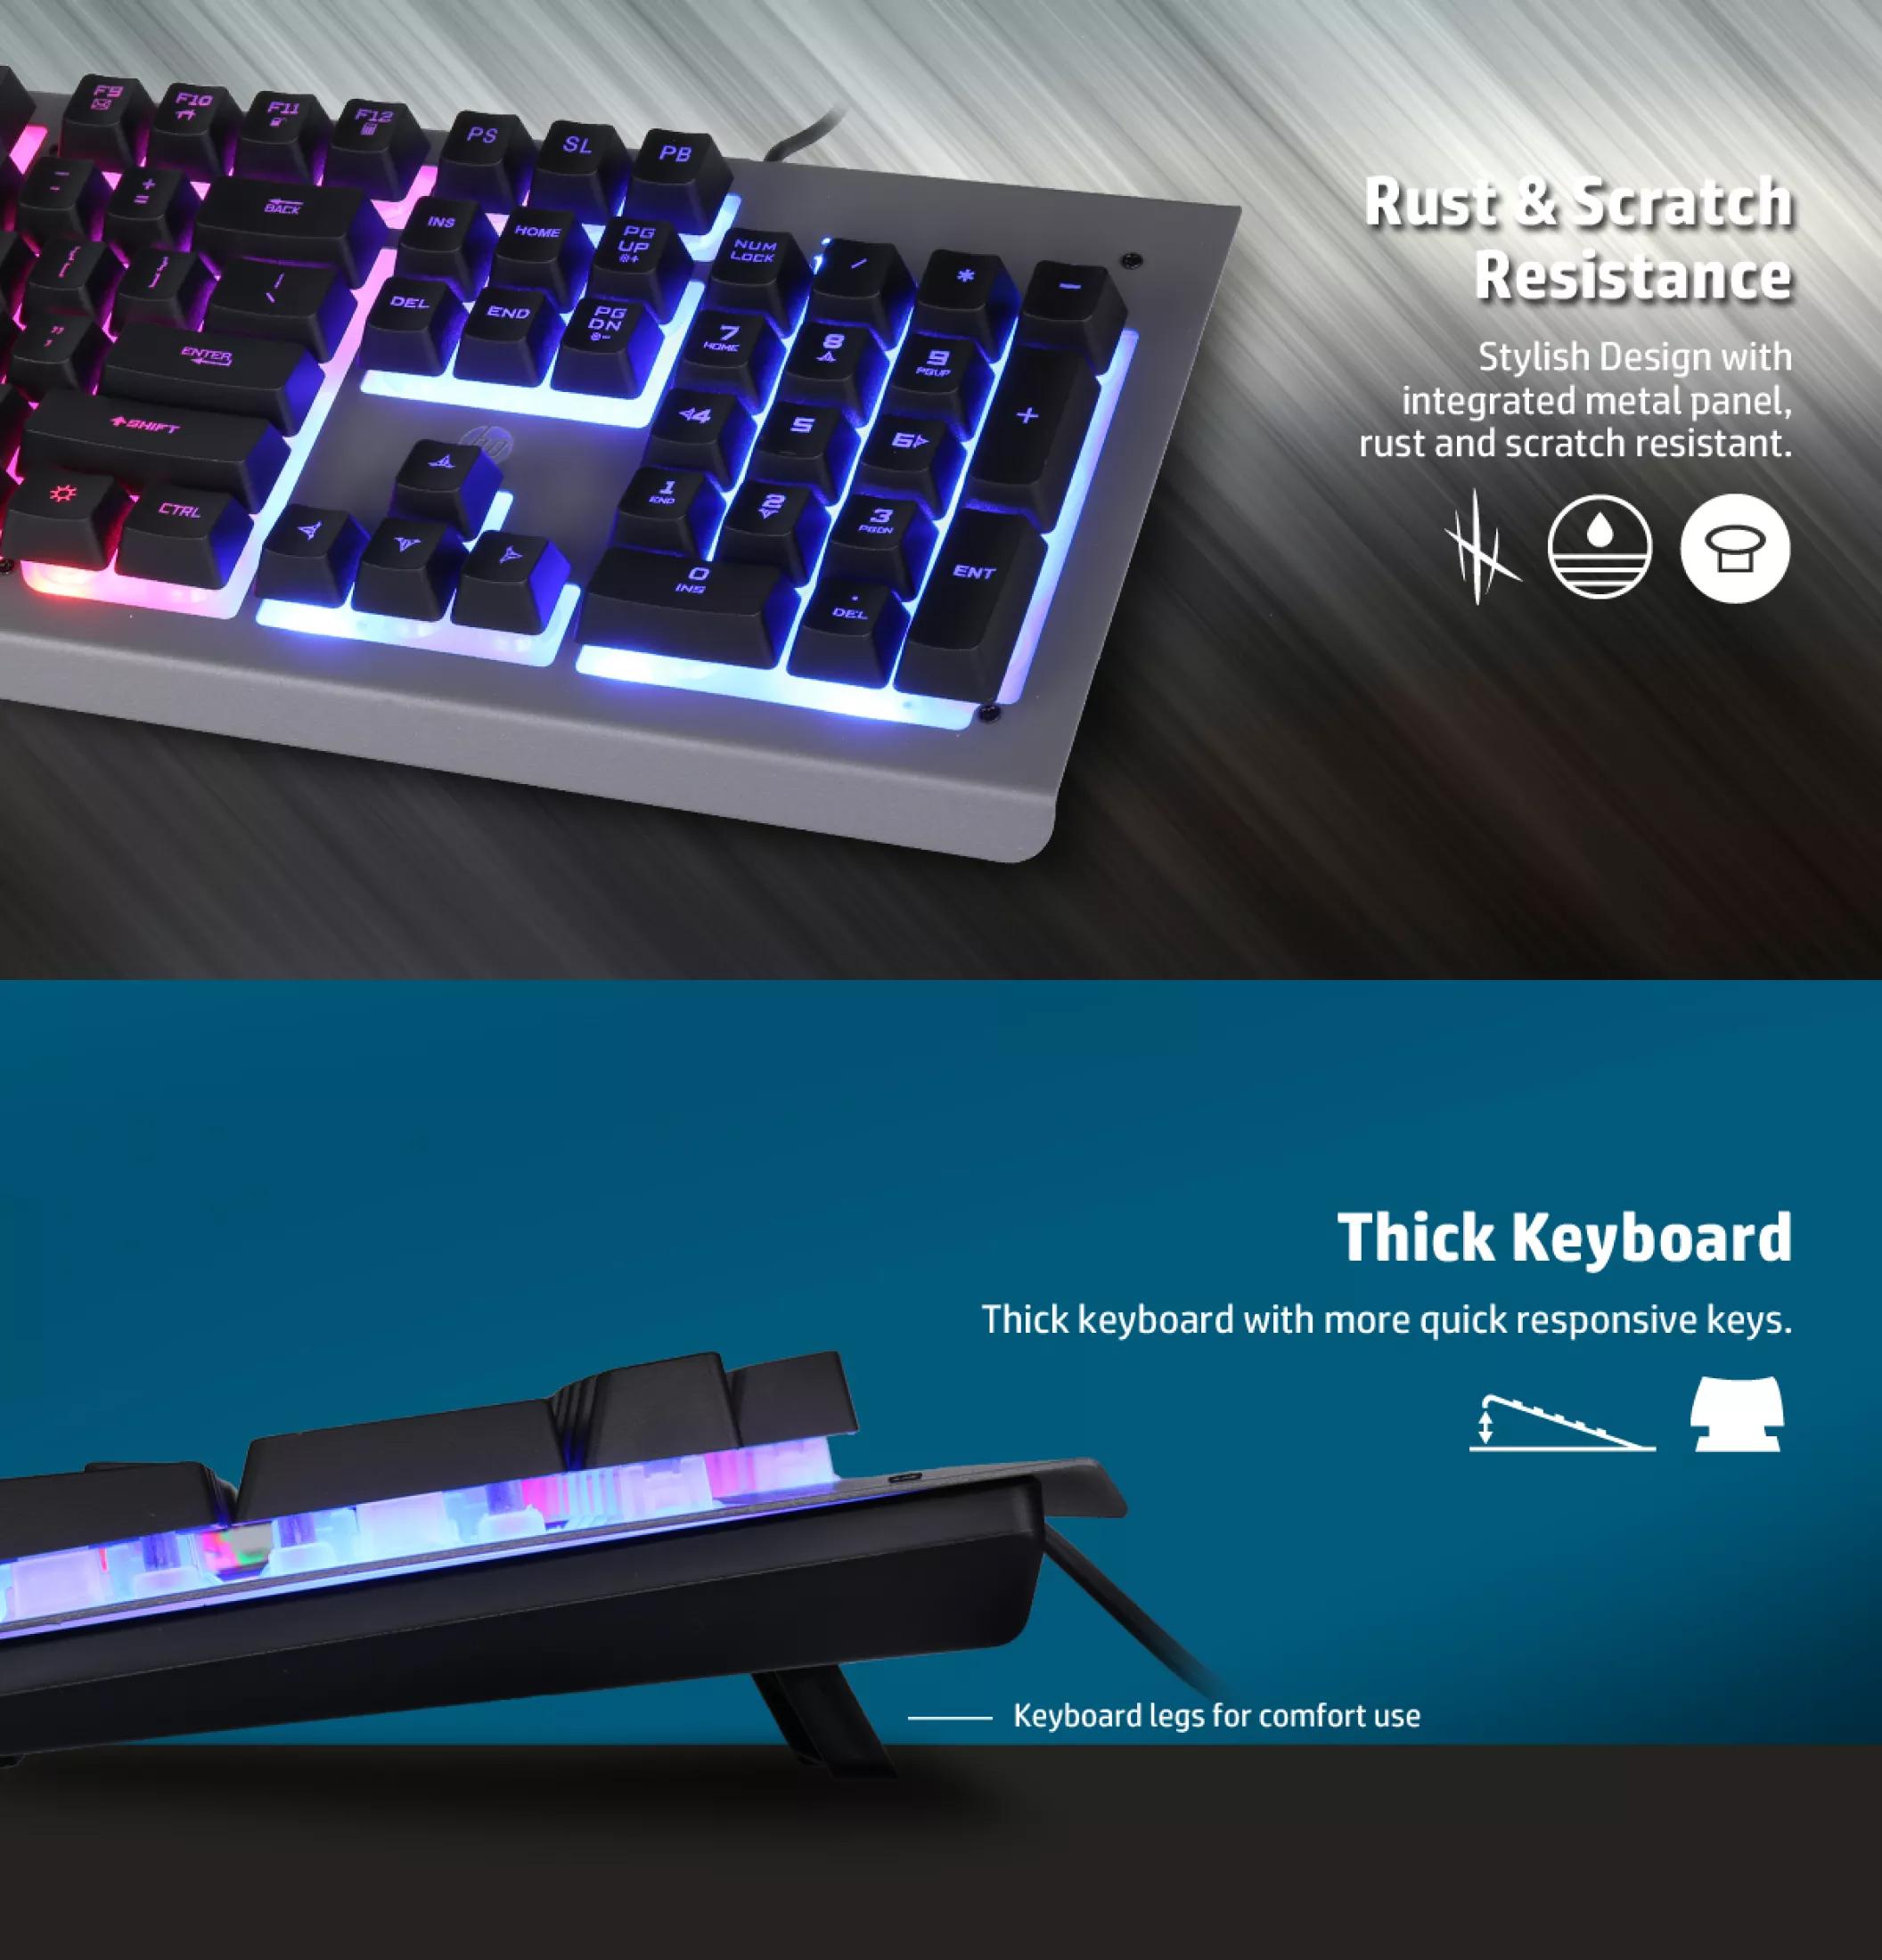 HP K100 USB Keyboard